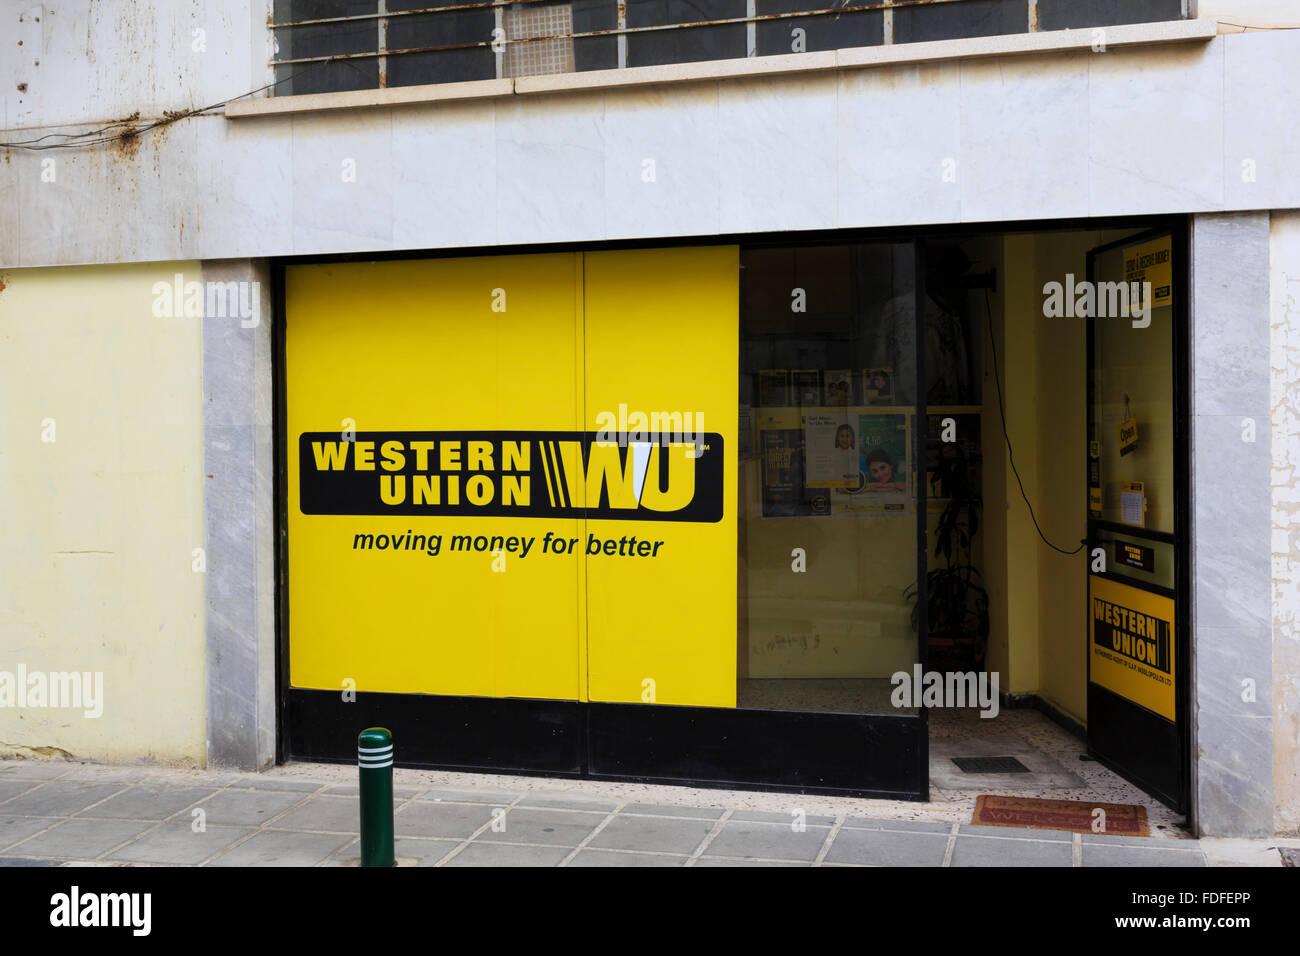 Western union shop stock photos western union shop stock images